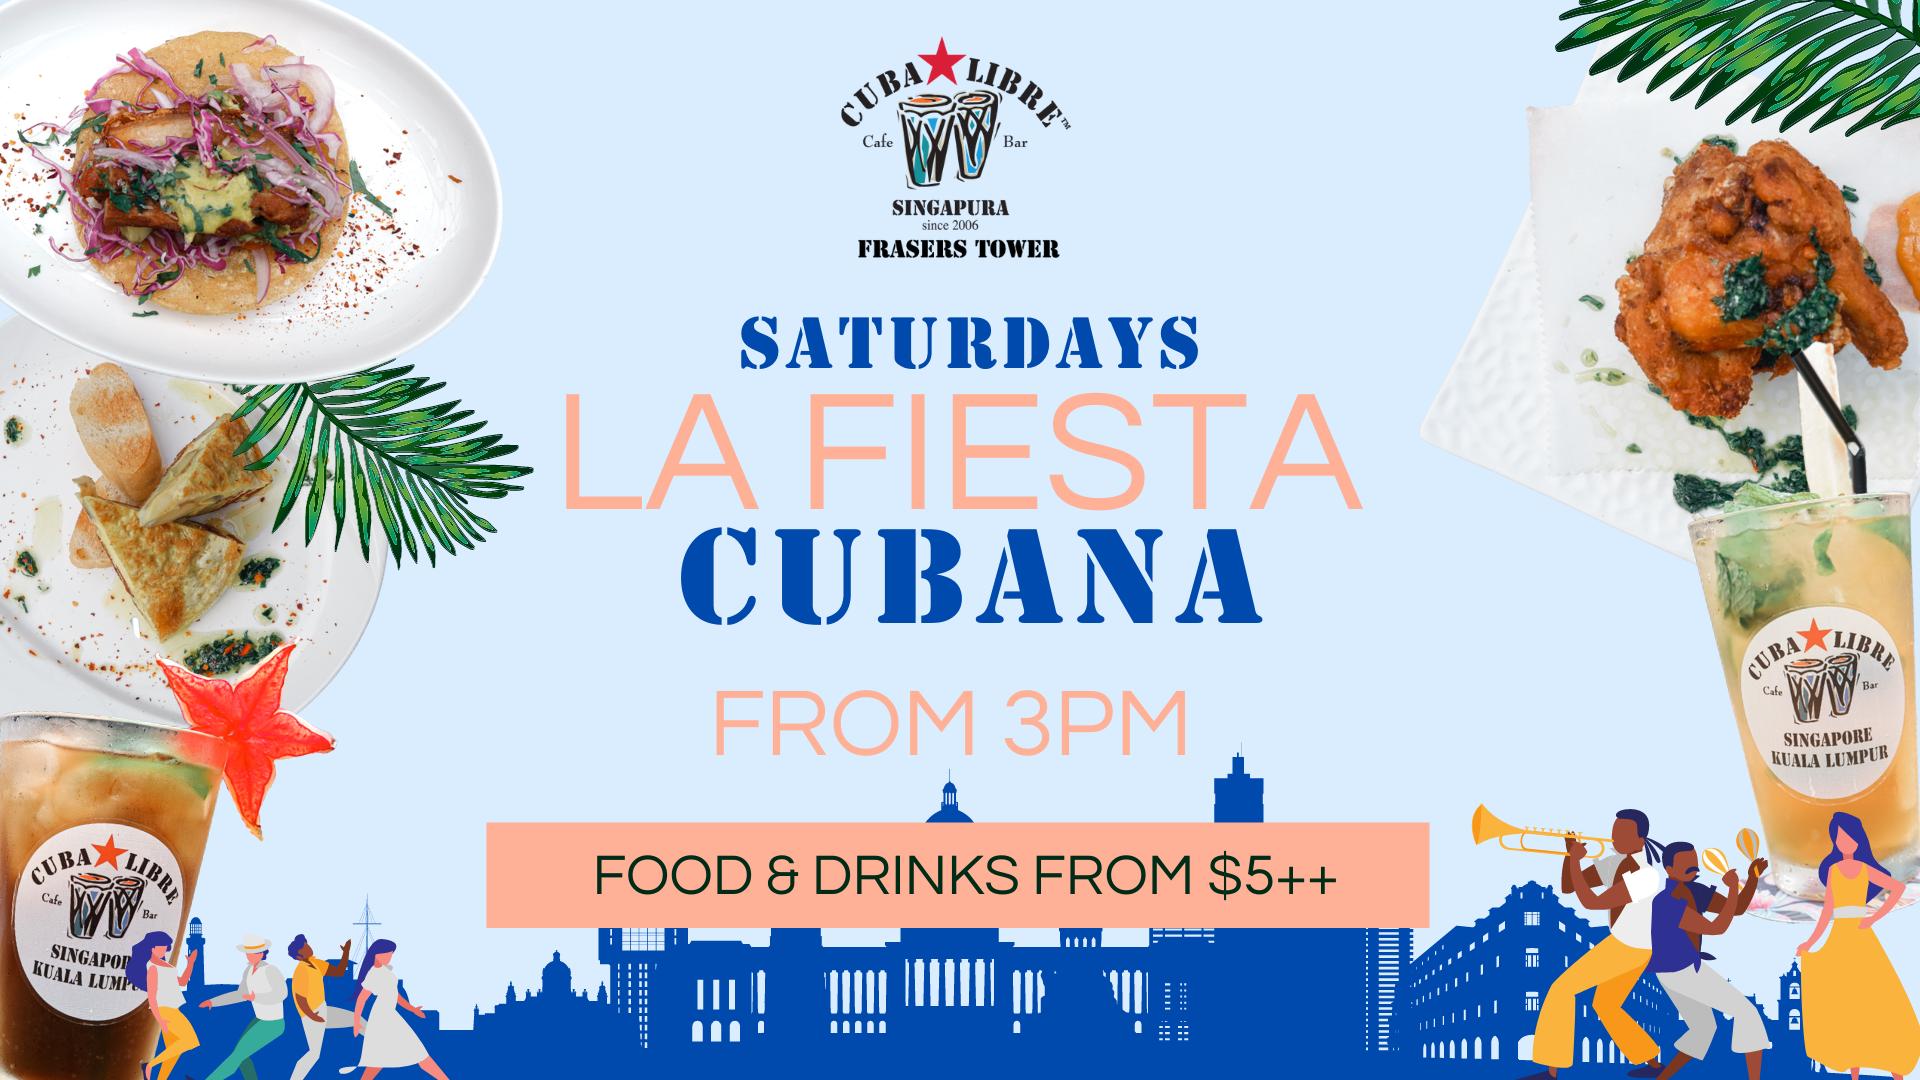 cuba-libre-frasers-tower-la-fiesta-cuban